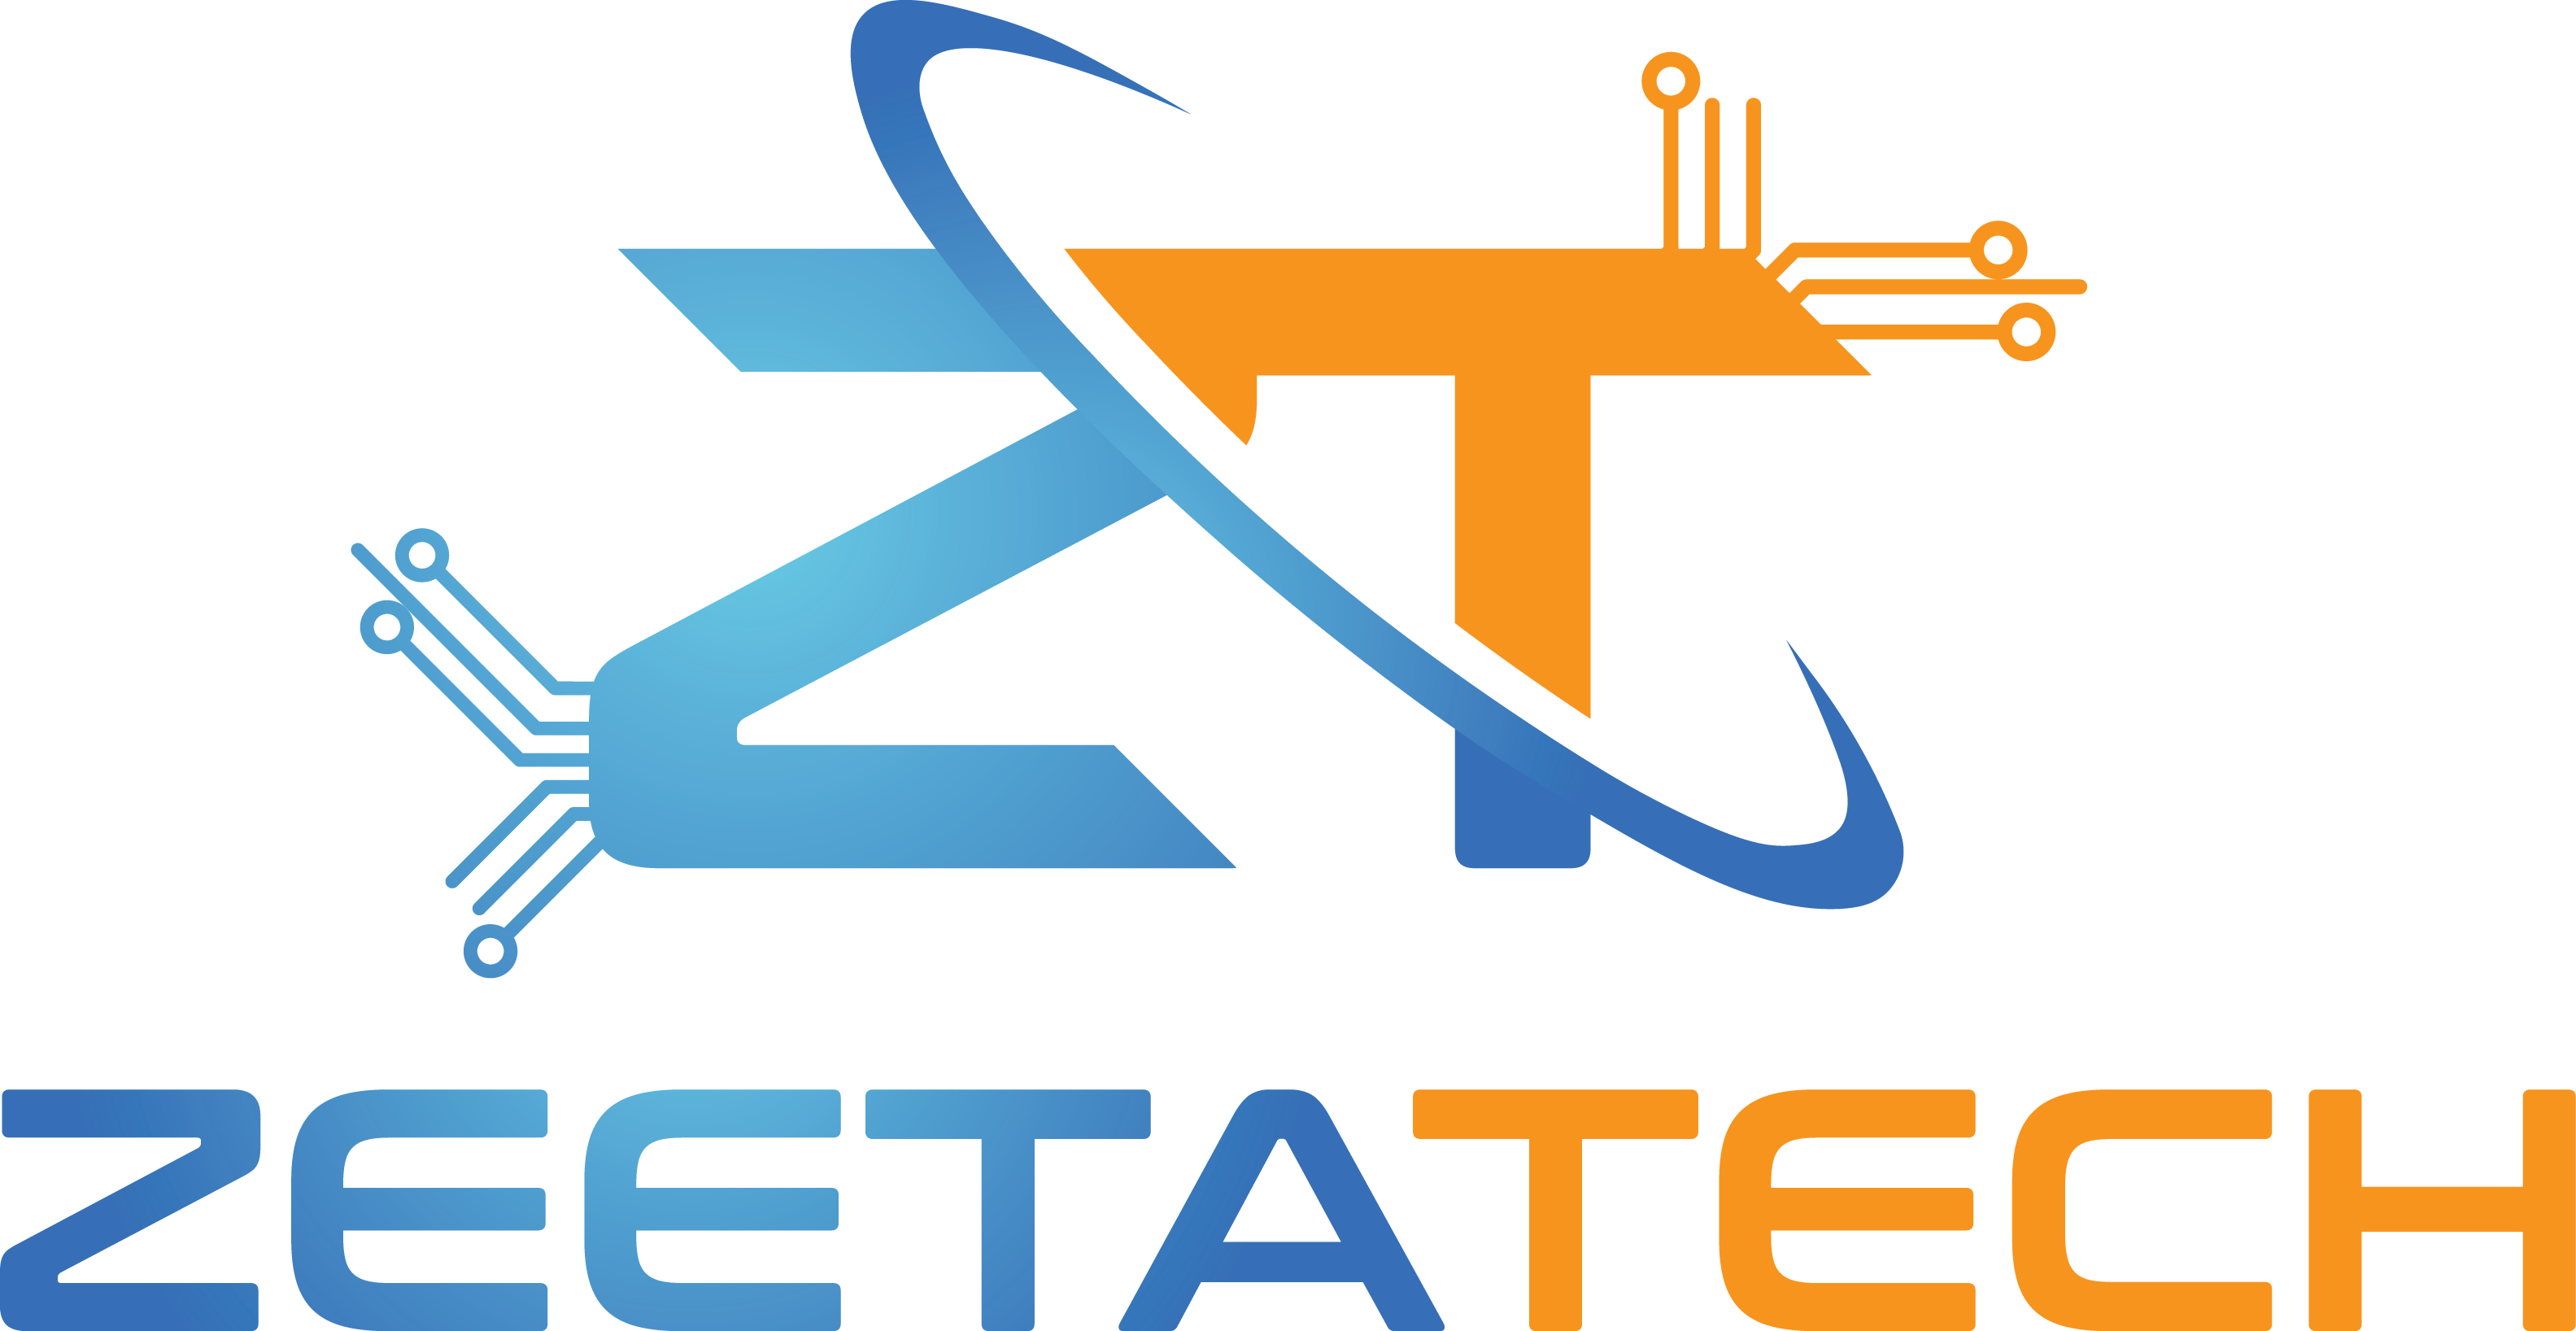 Zeeta Tech